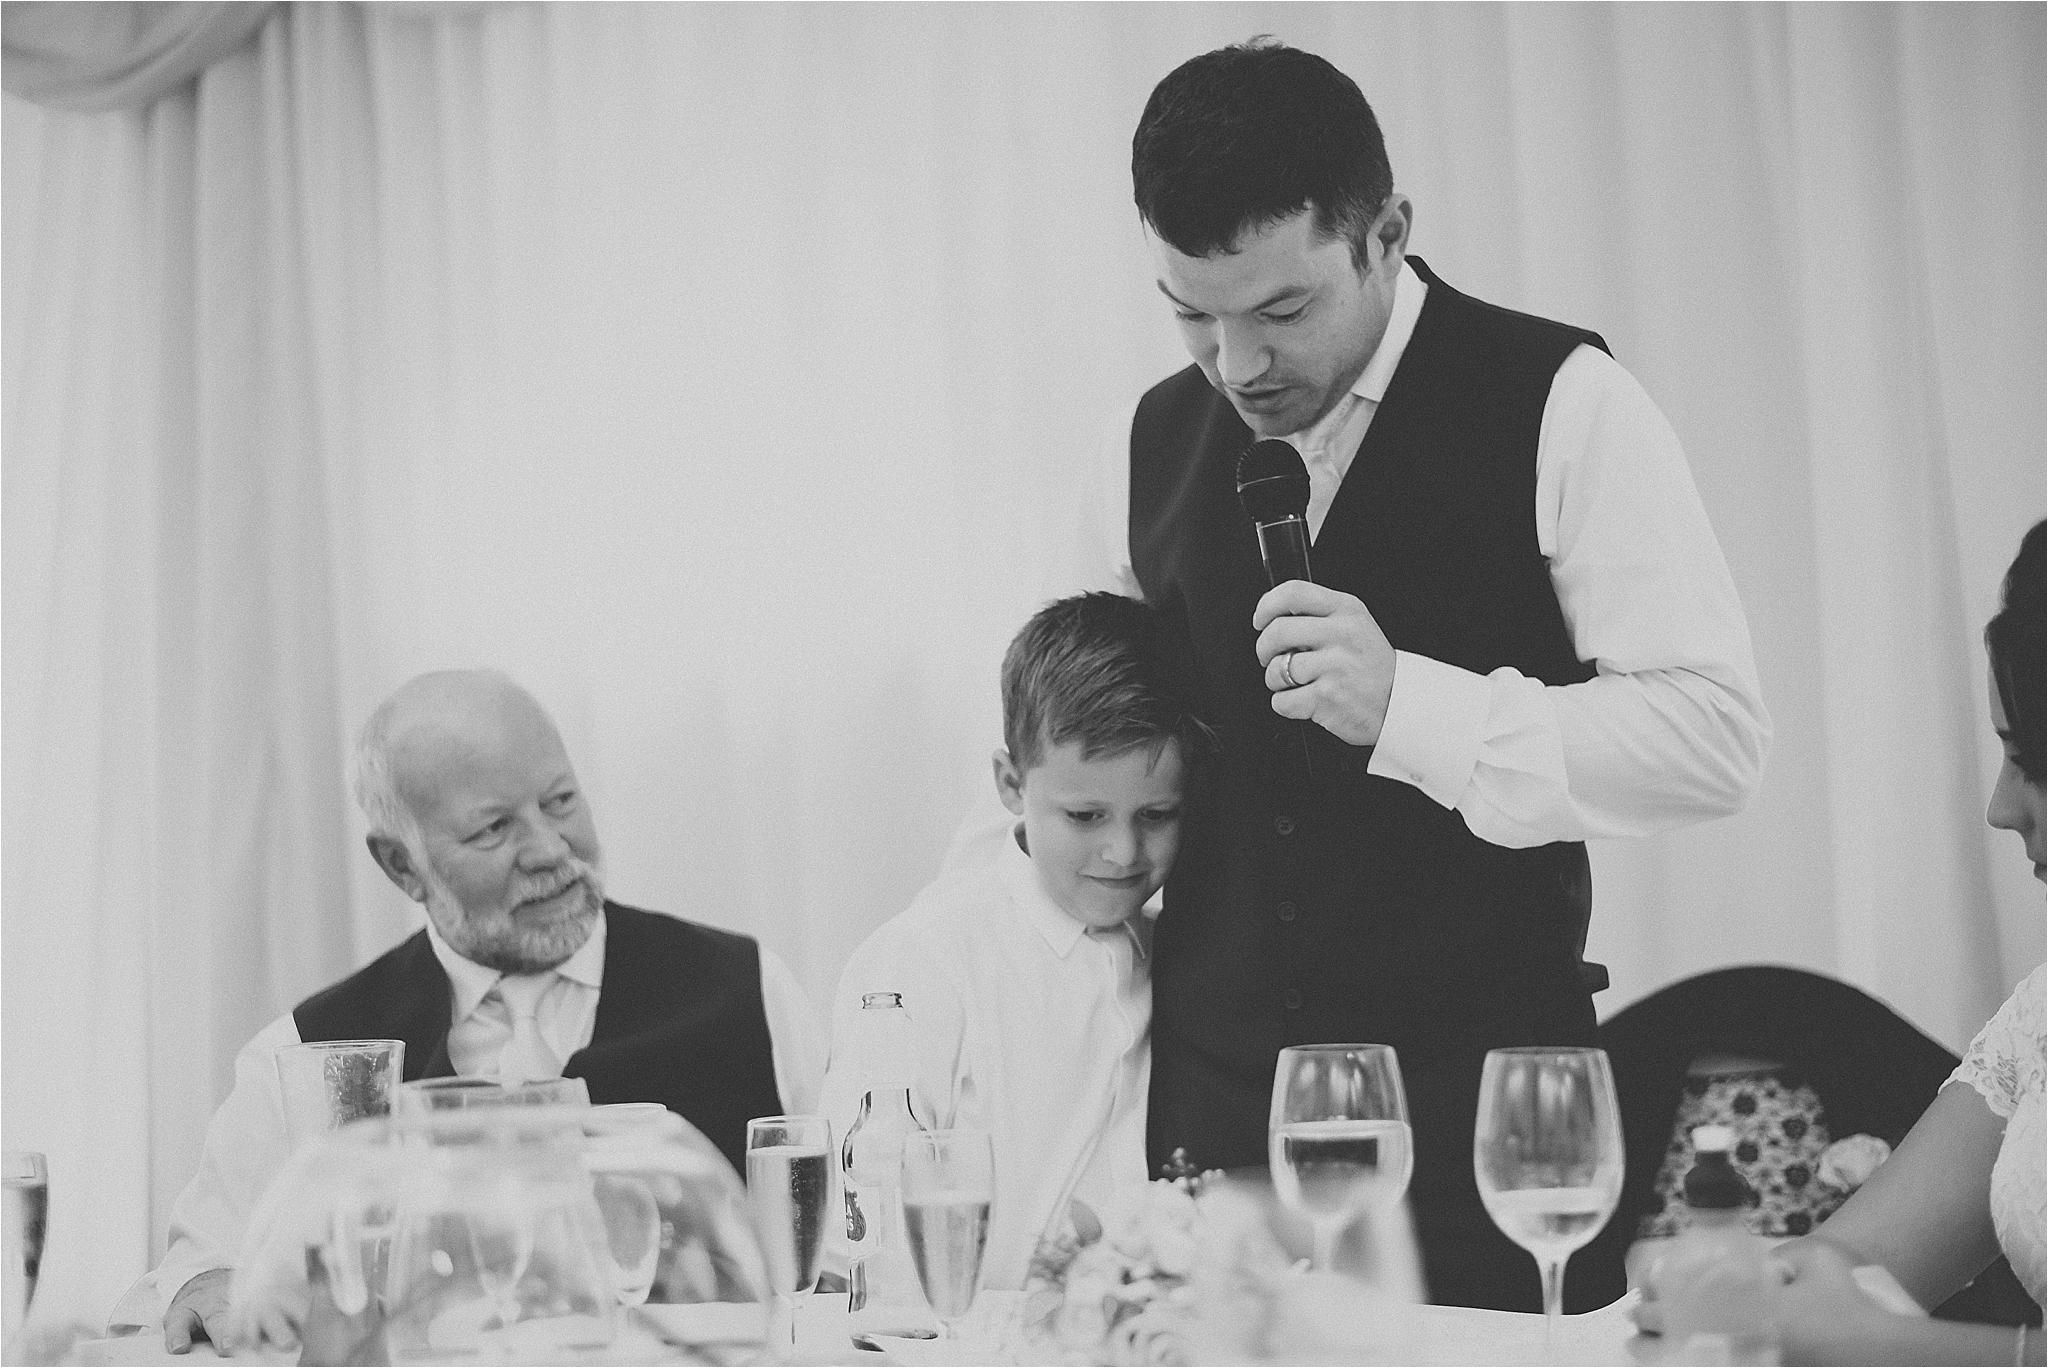 thevilla+lancashire+wreagreen+wedding+photographer52.jpg